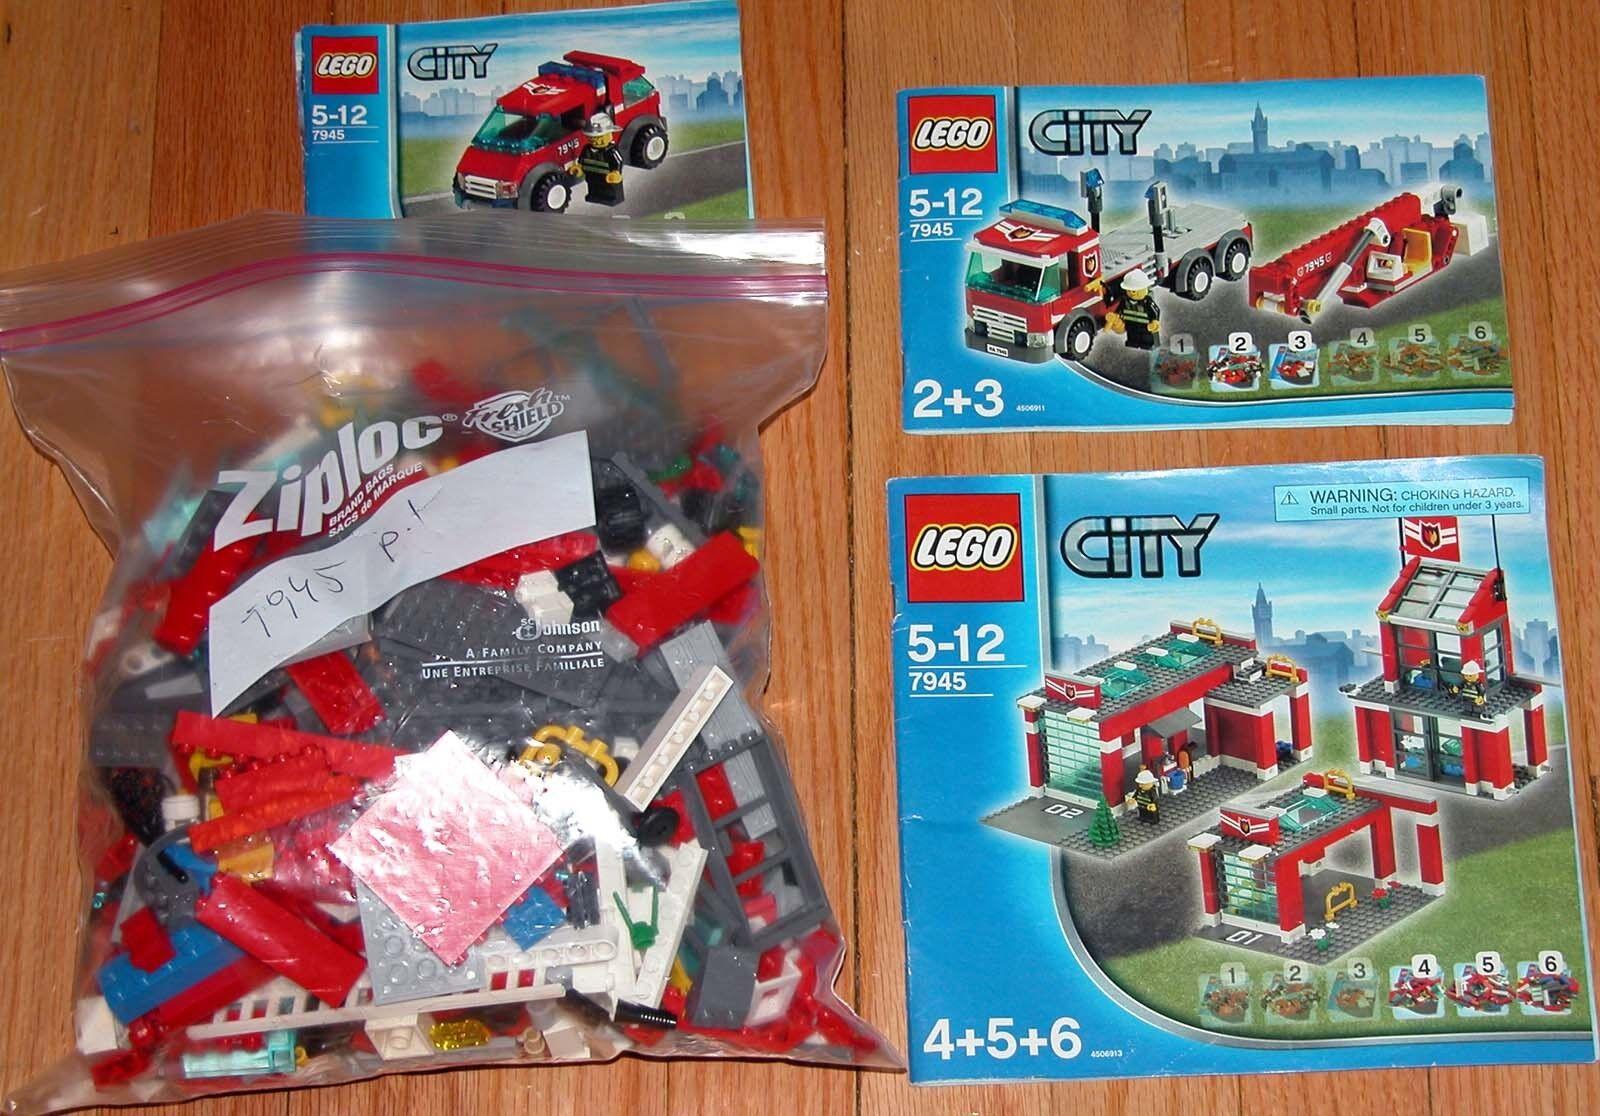 LEGO 7945 CITY CITY CITY FIRE STATION COMPLETE ef22ca